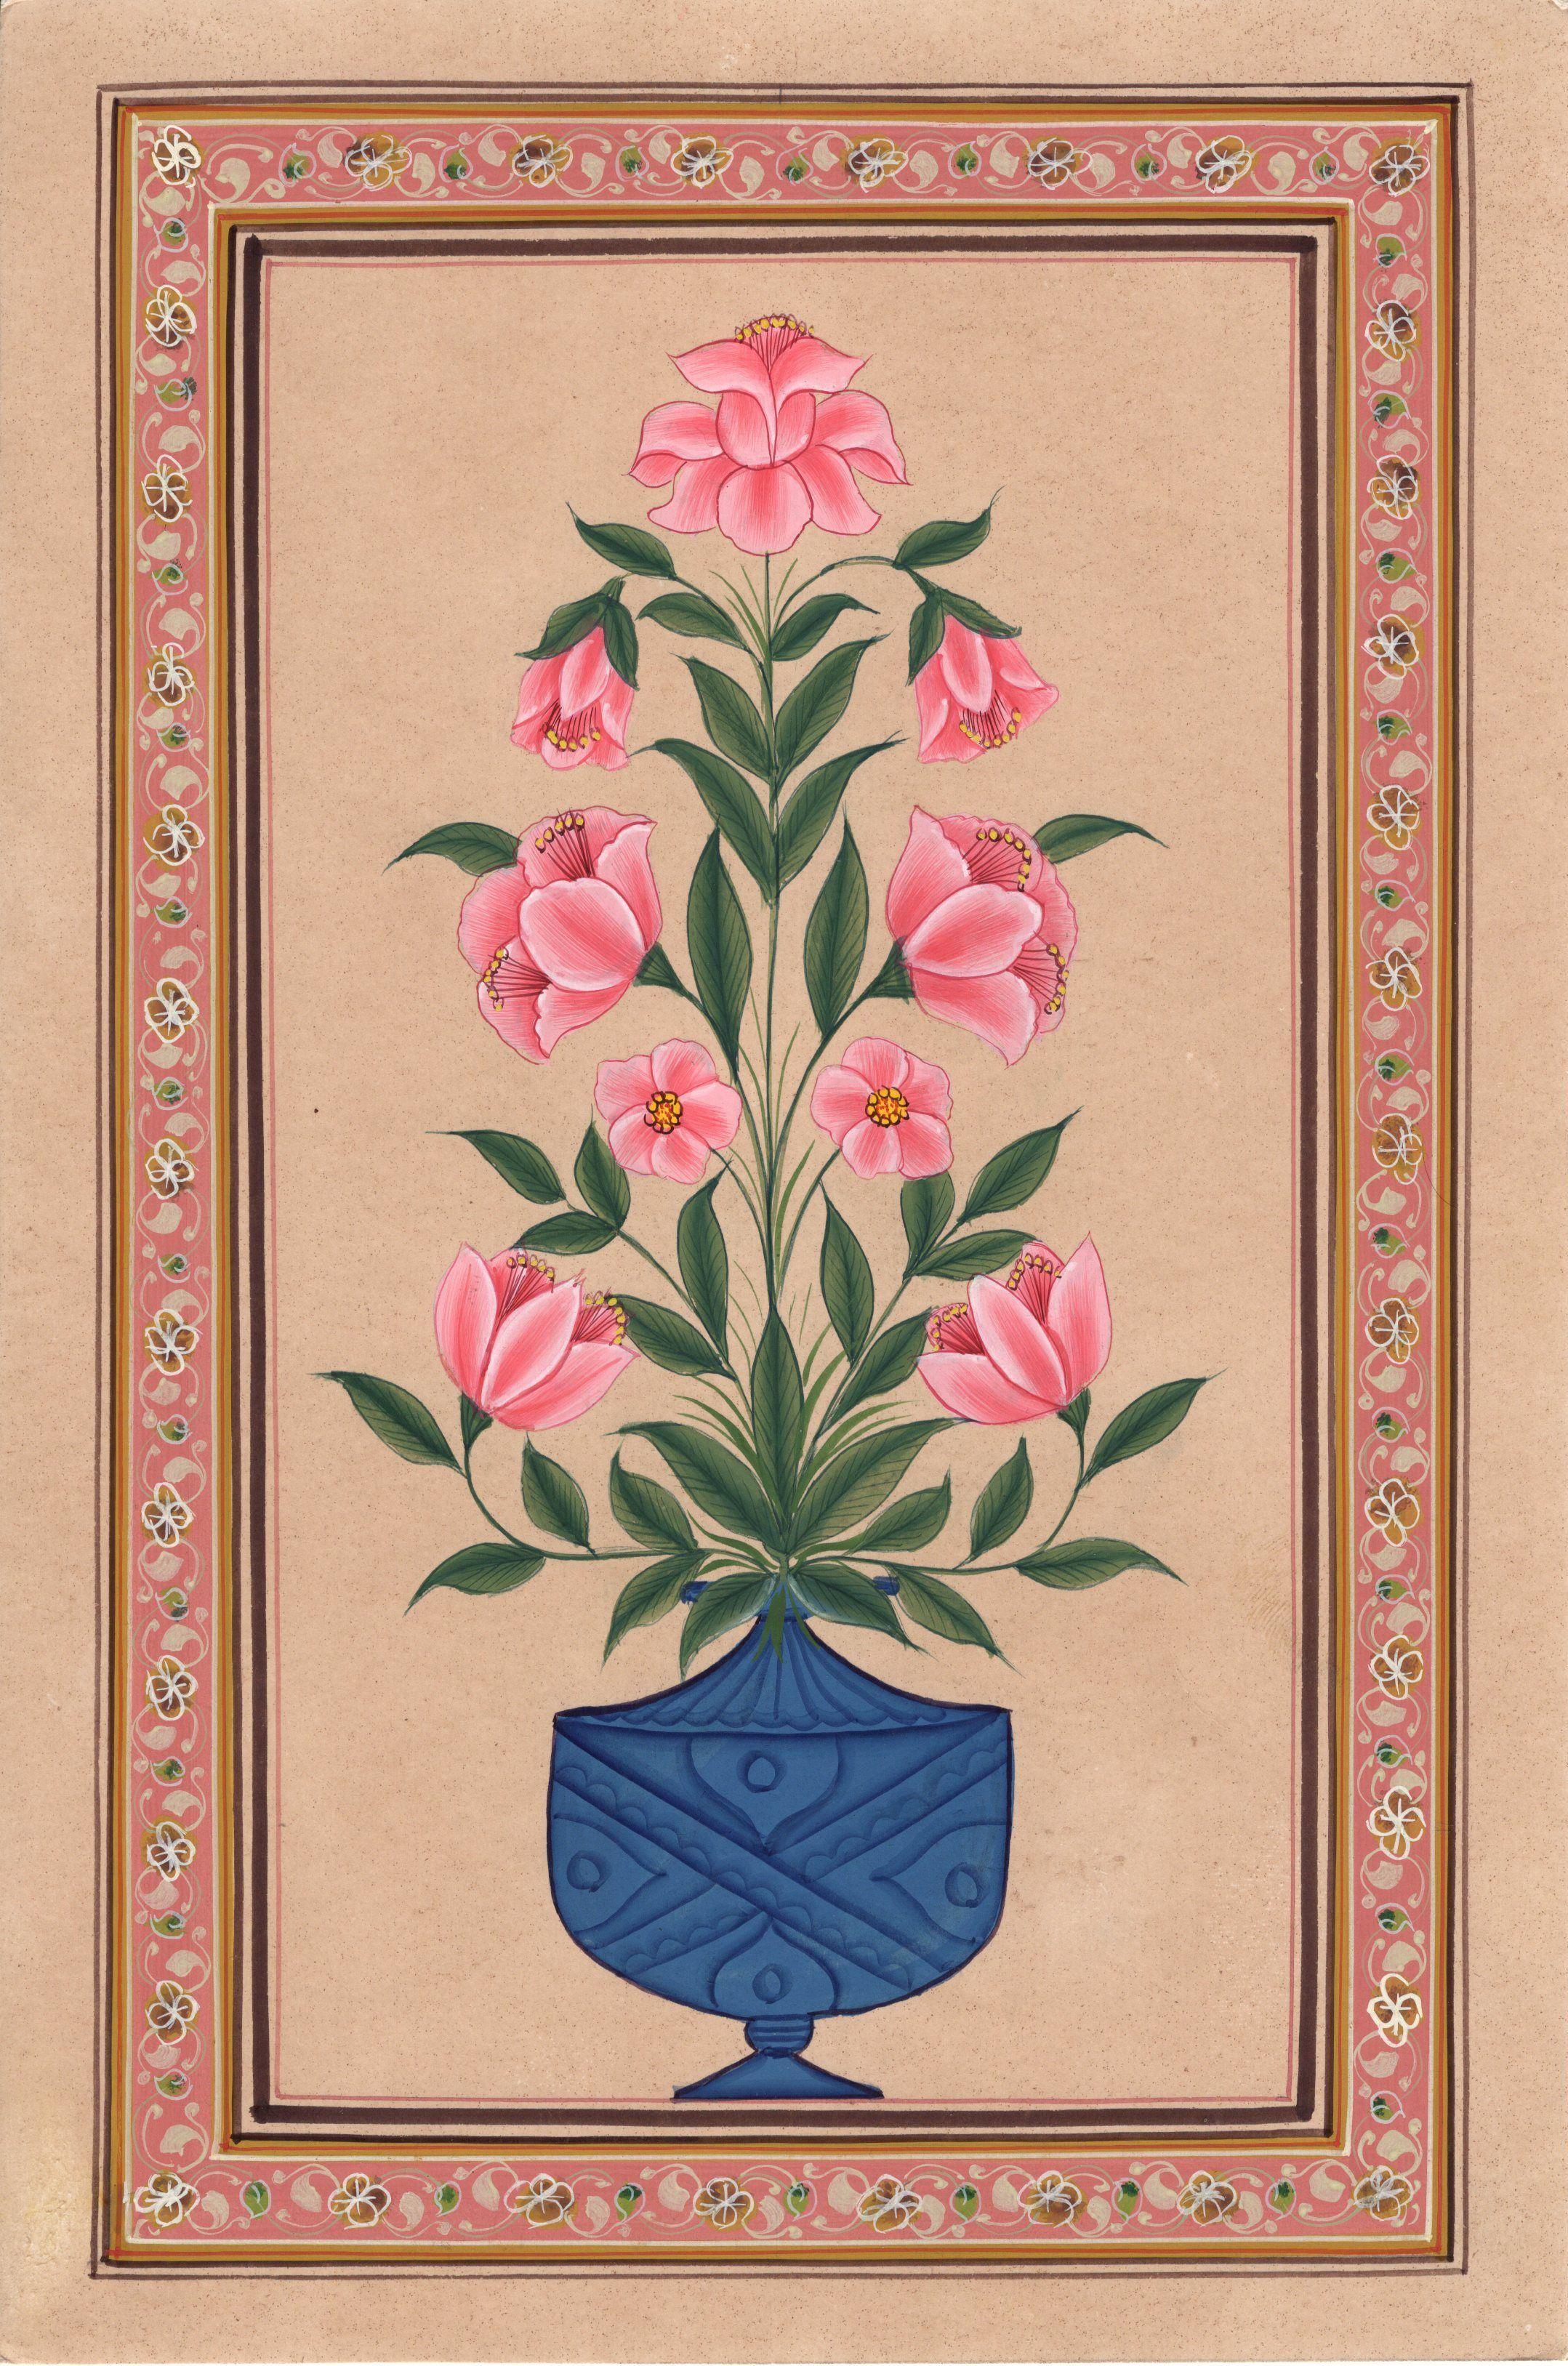 Mughal floral miniature painting moghul indian handmade nature lotus mughal floral miniature painting moghul indian handmade nature lotus flower art izmirmasajfo